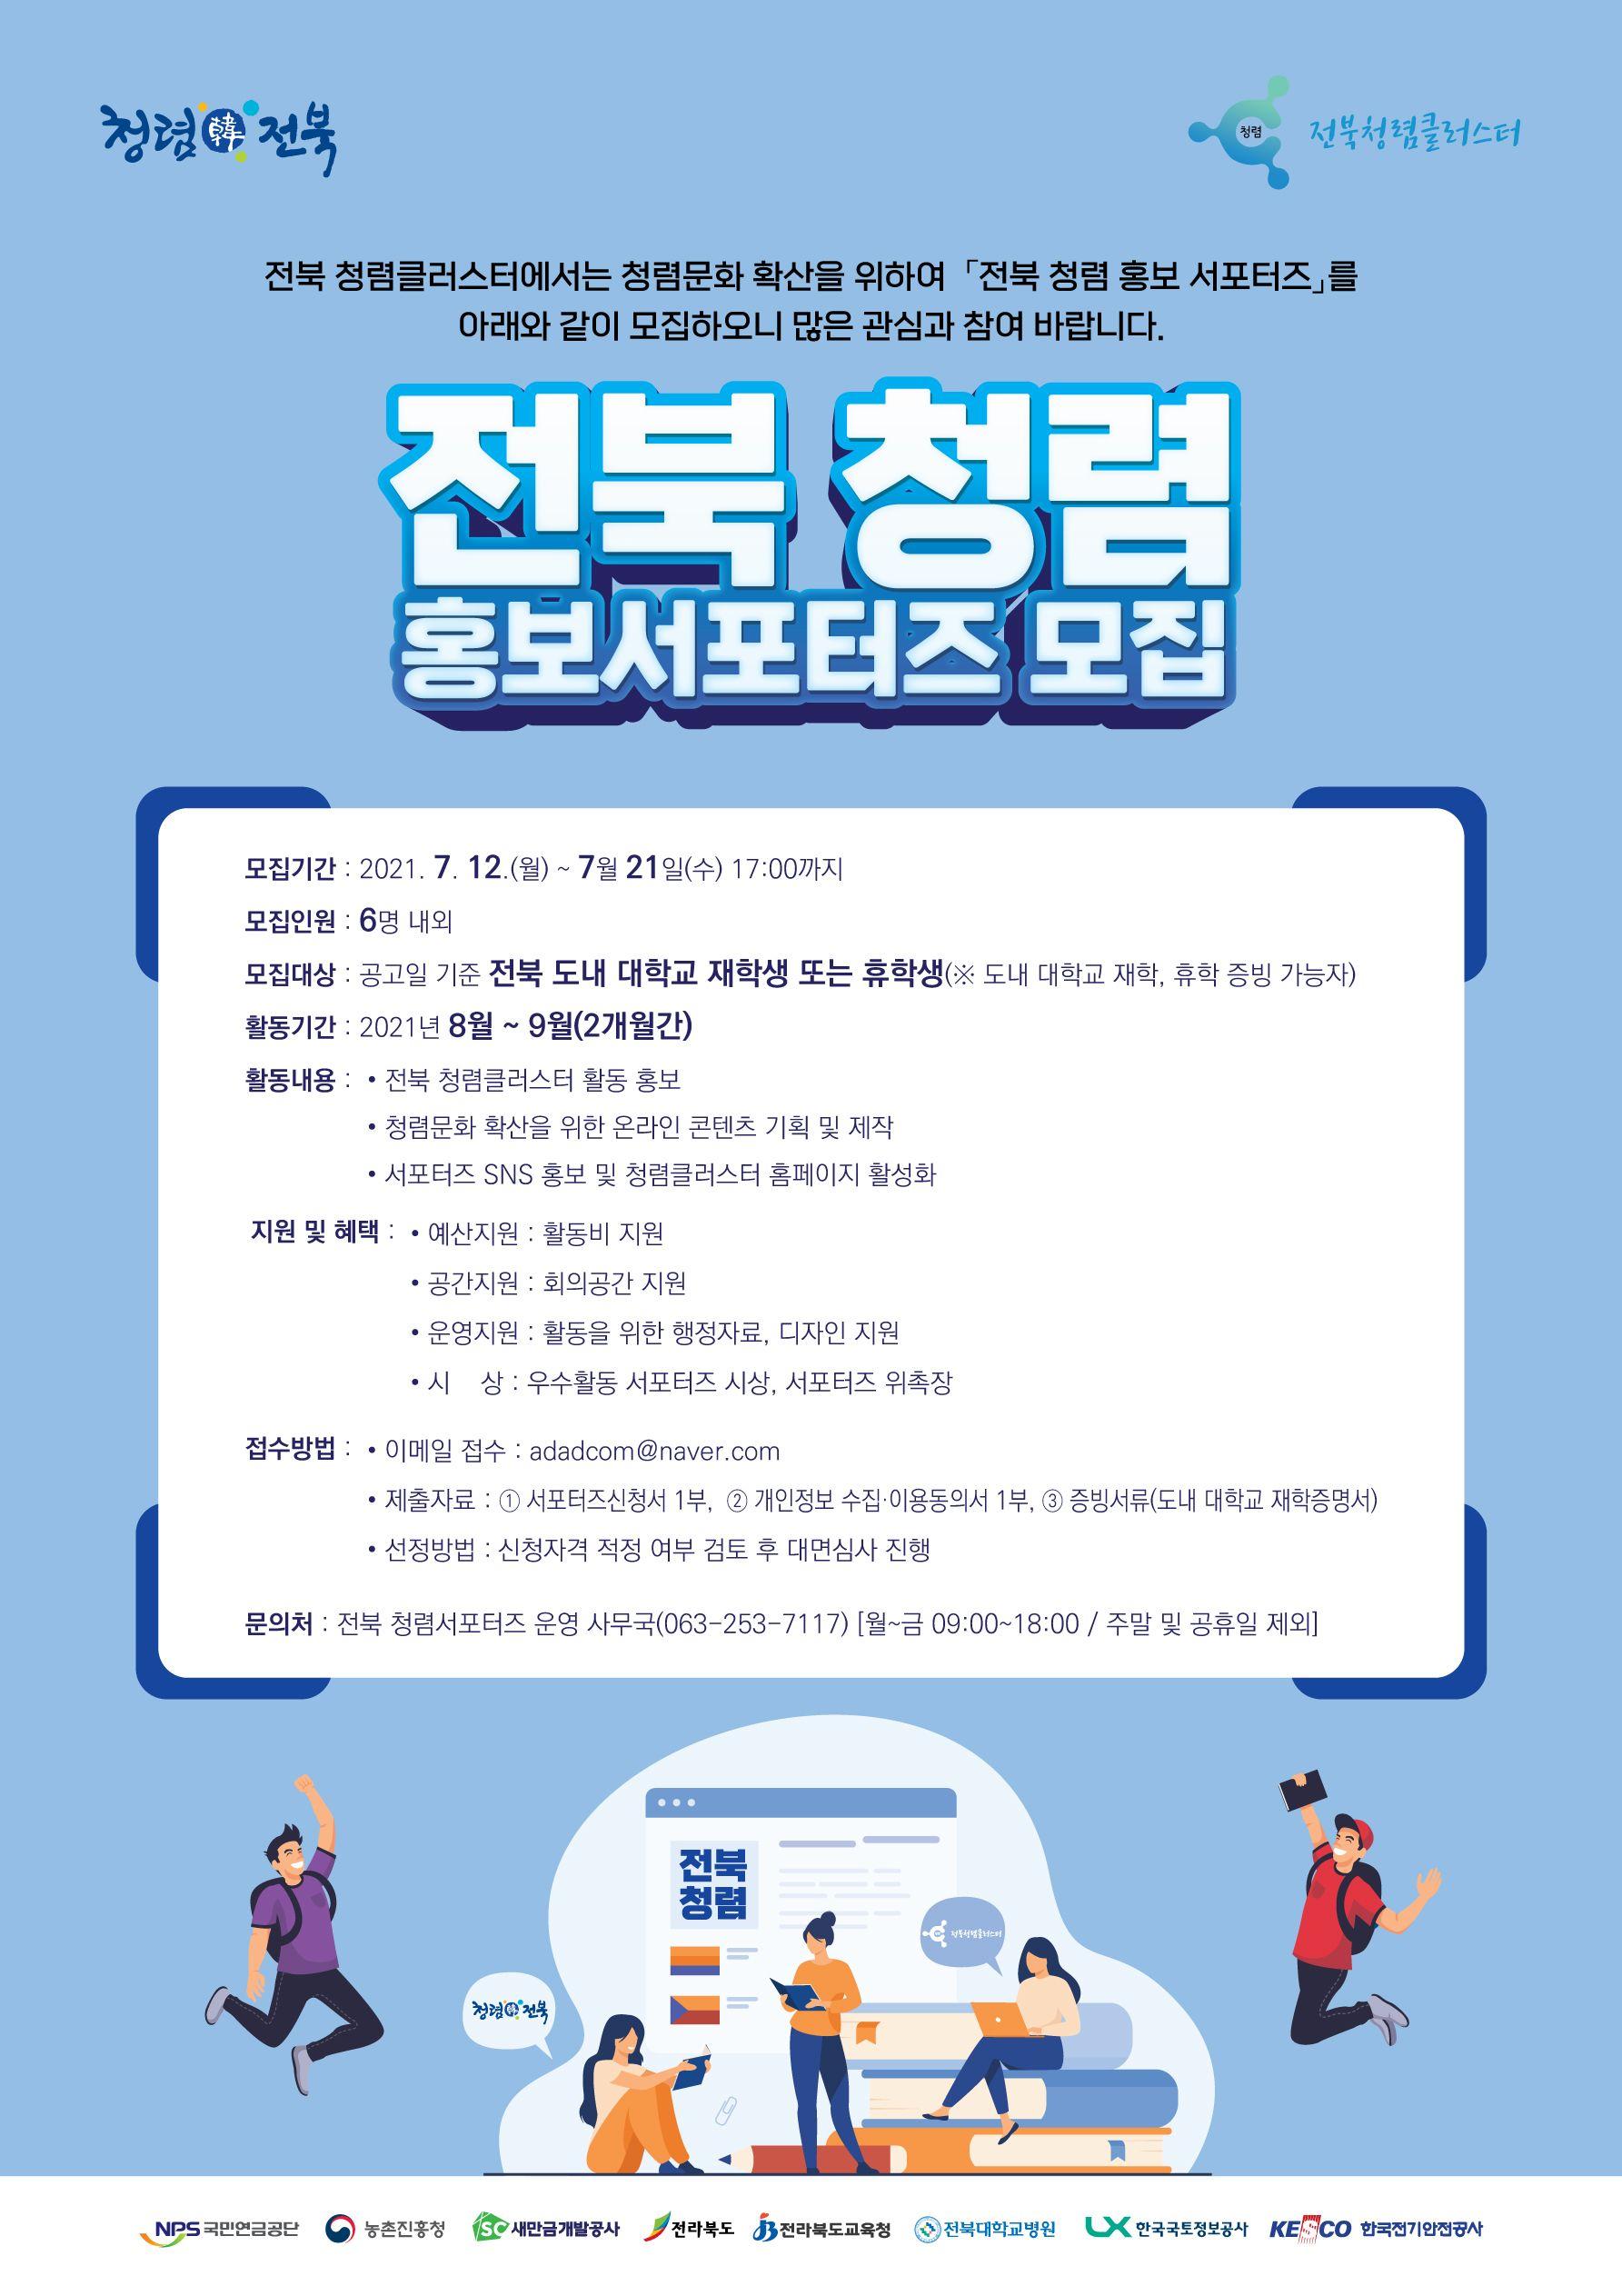 전북 청렴홍보서포터즈 모집